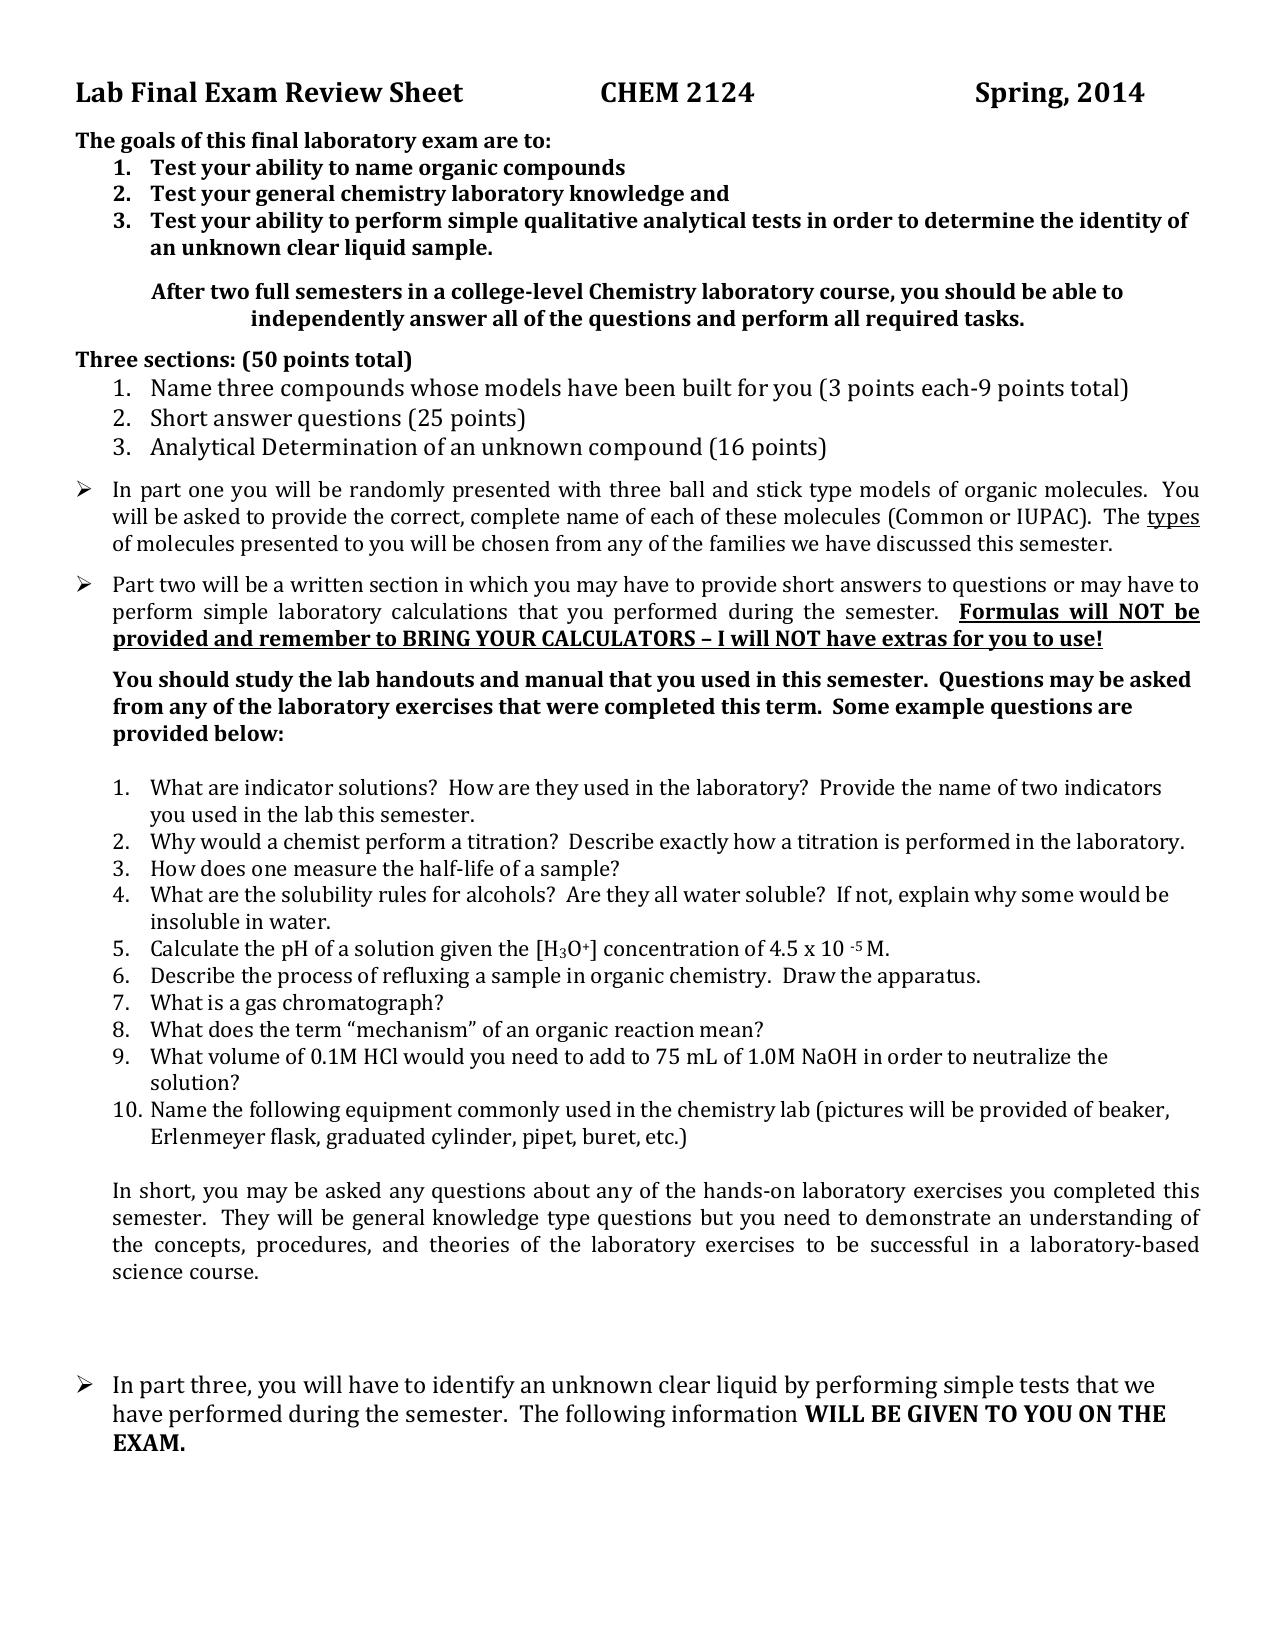 Lab Final Exam Review Sheet CHEM 2124 Spring, 2014